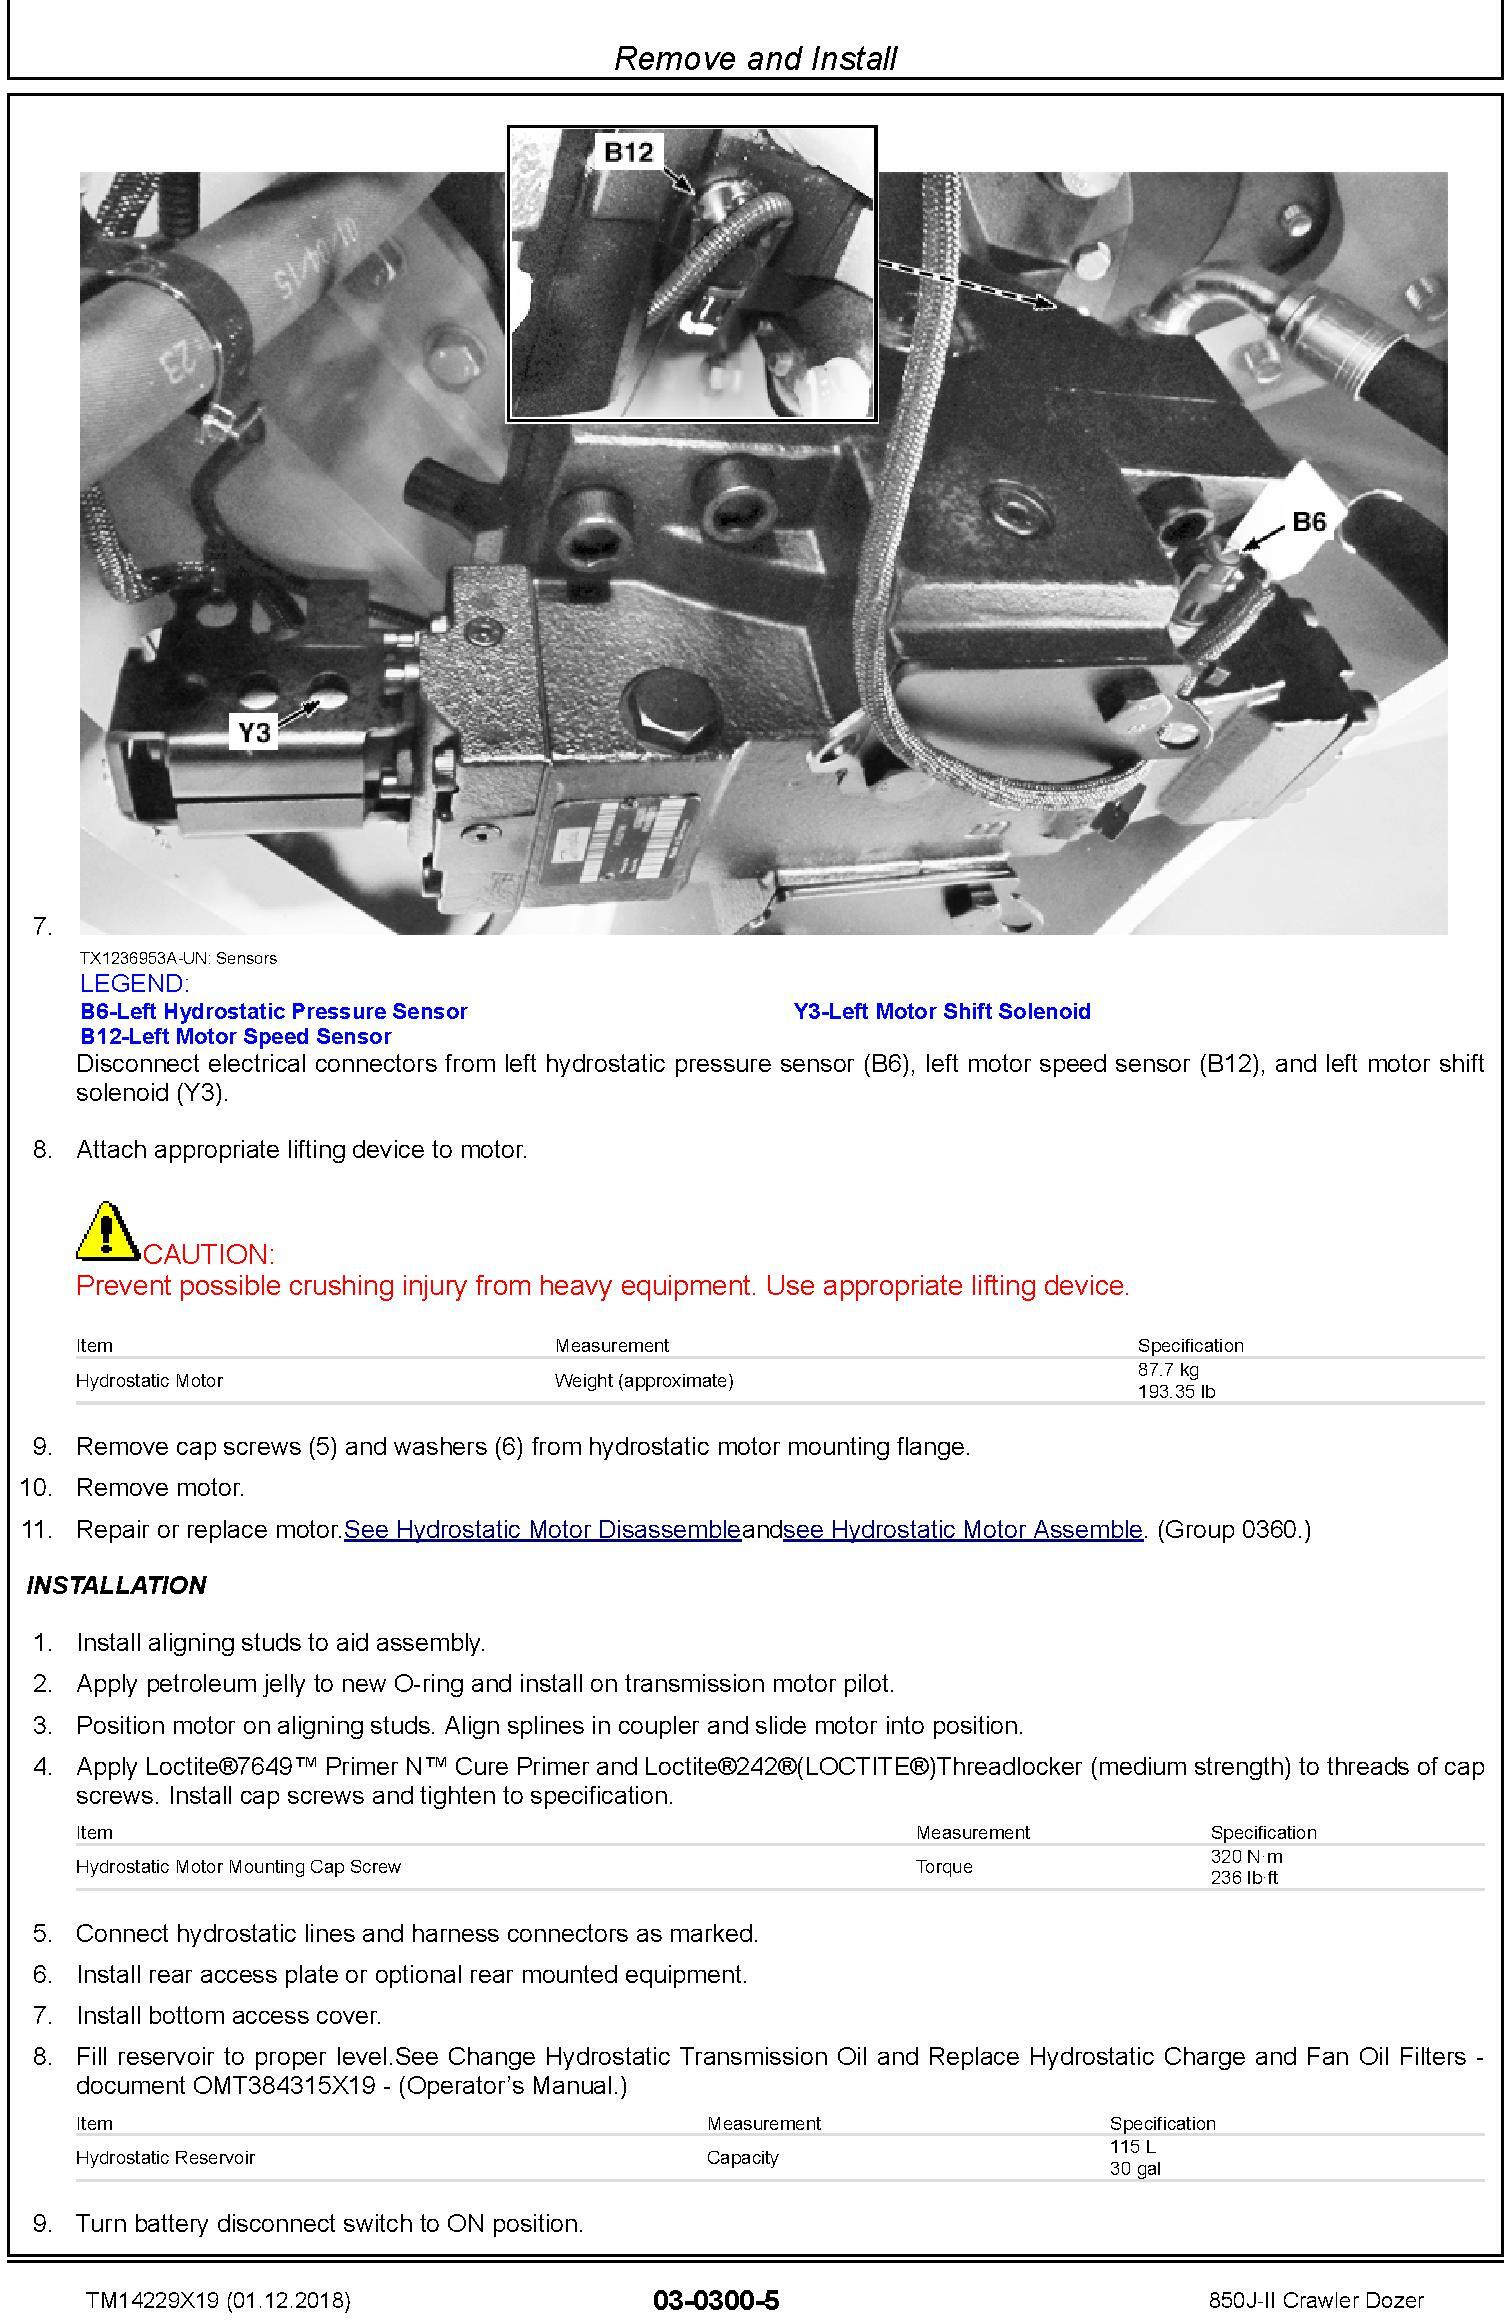 John Deere 850J-II (SN. C306799-354851) Crawler Dozer Repair Technical Service Manual (TM14229X19) - 3